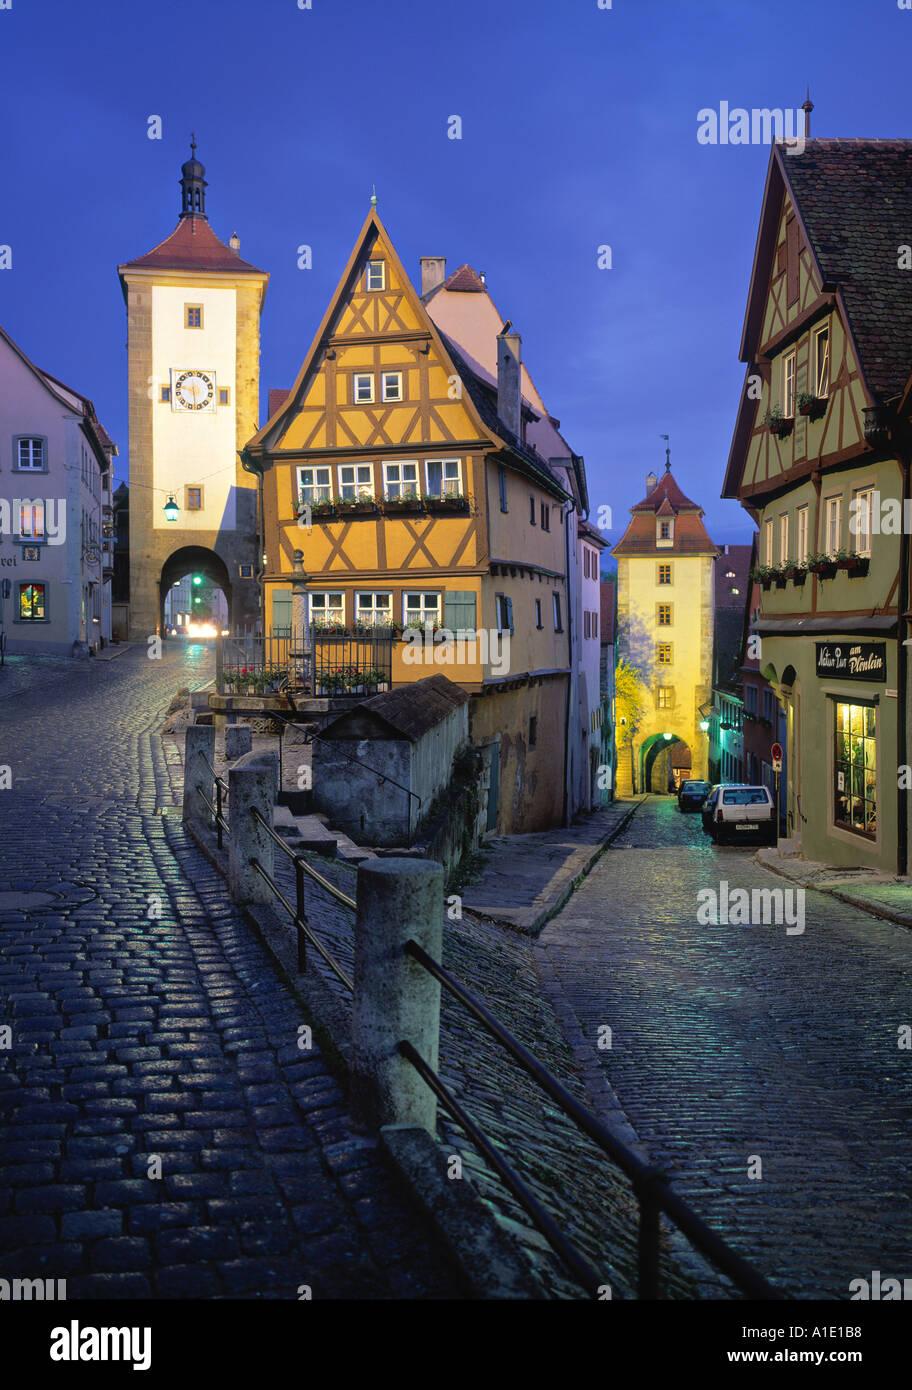 Rothenburg Ob Der Tauber, Bavaria, Germany - Stock Image